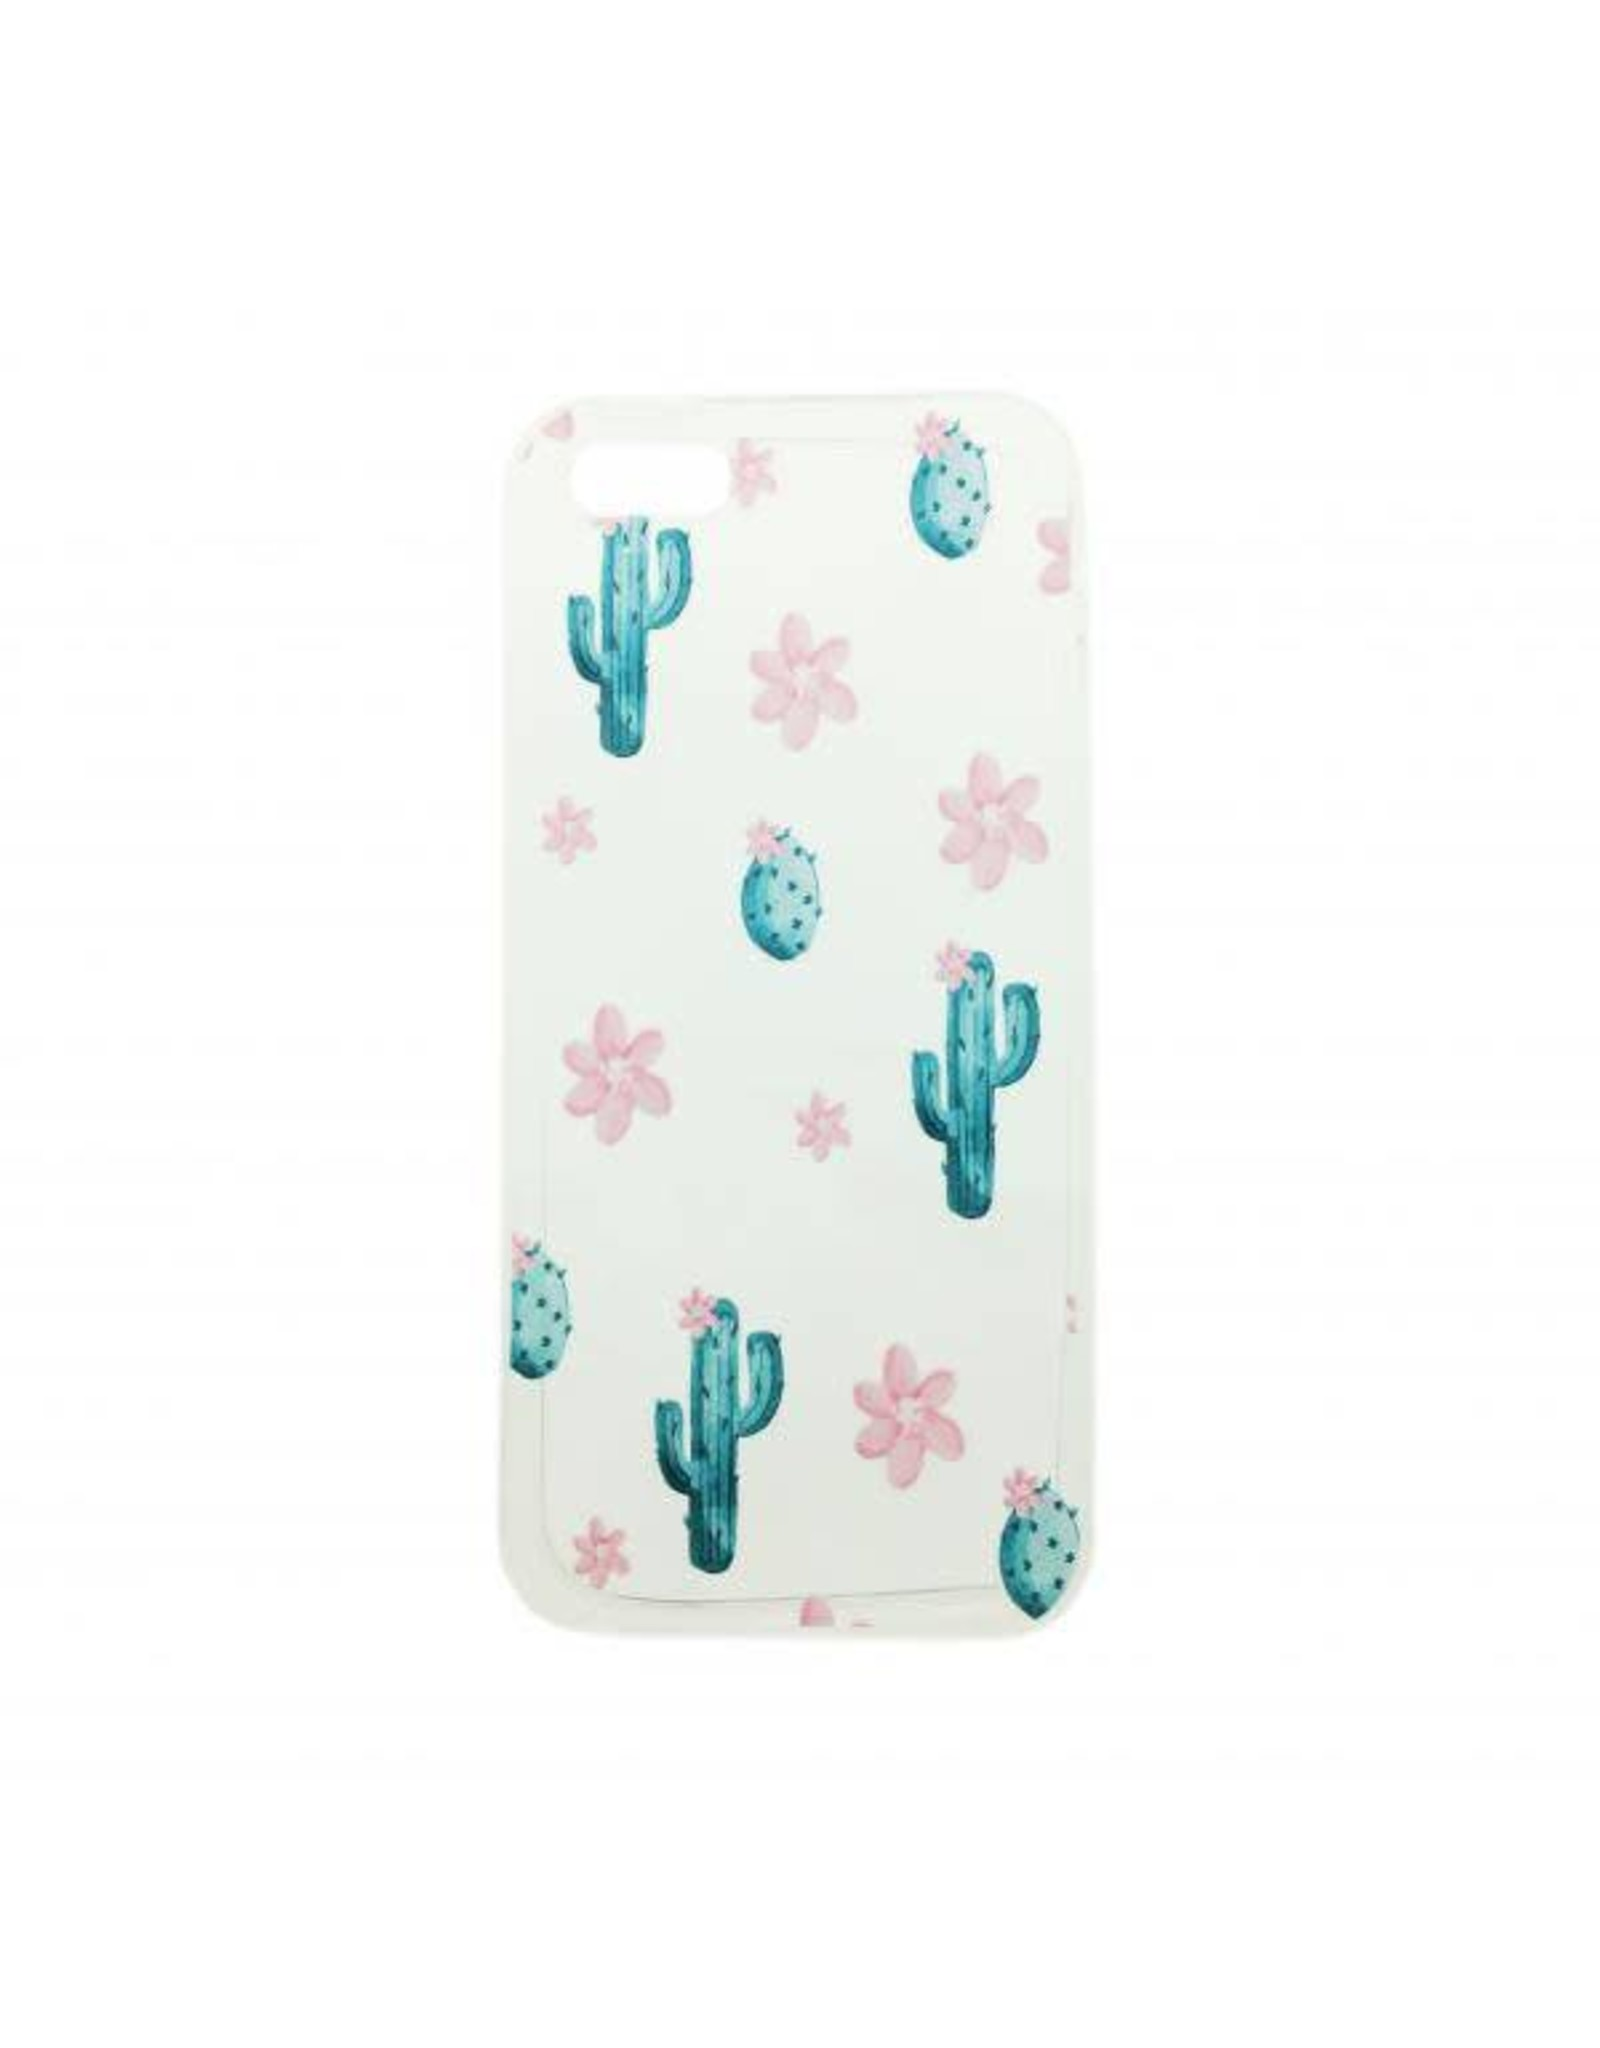 Hoesje iPhone cactus 7